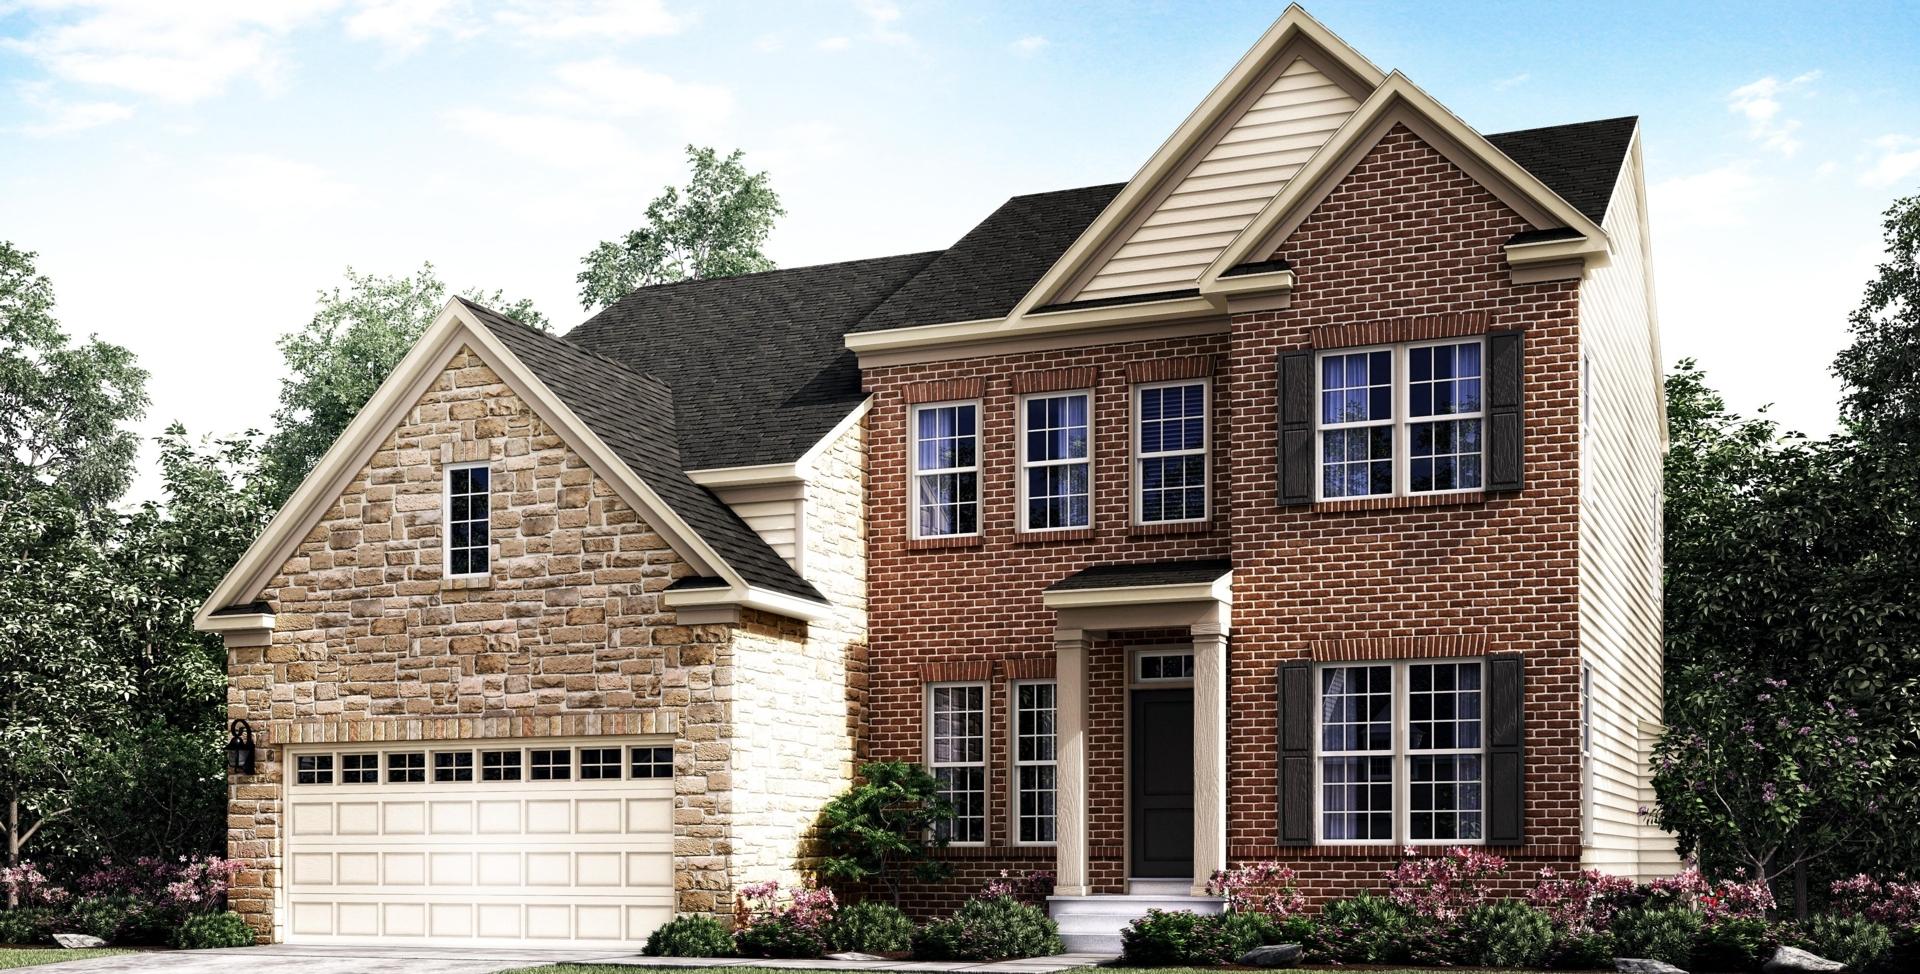 Single family home in md va matera mid atlantic builders for Mid atlantic home builders